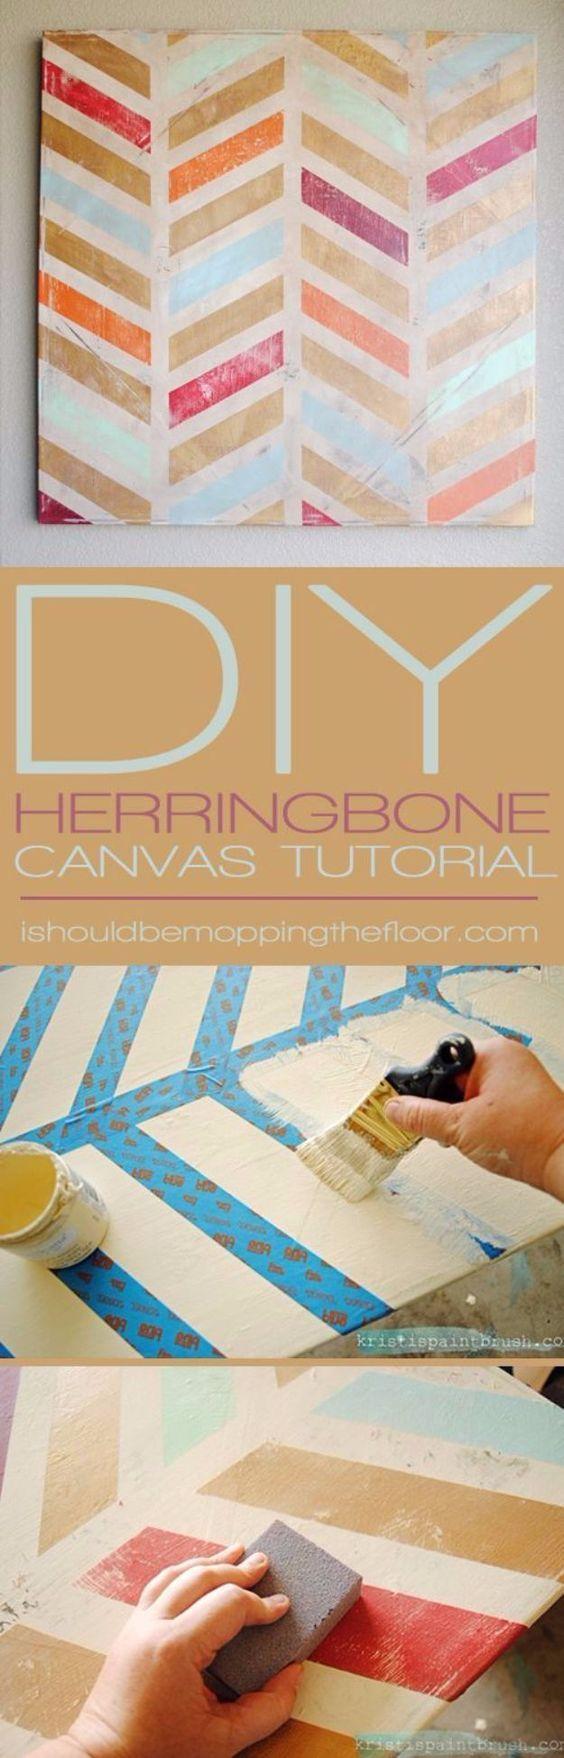 25 Creative And Easy Diy Canvas Wall Art Ideas : Best ideas about dorm canvas art on